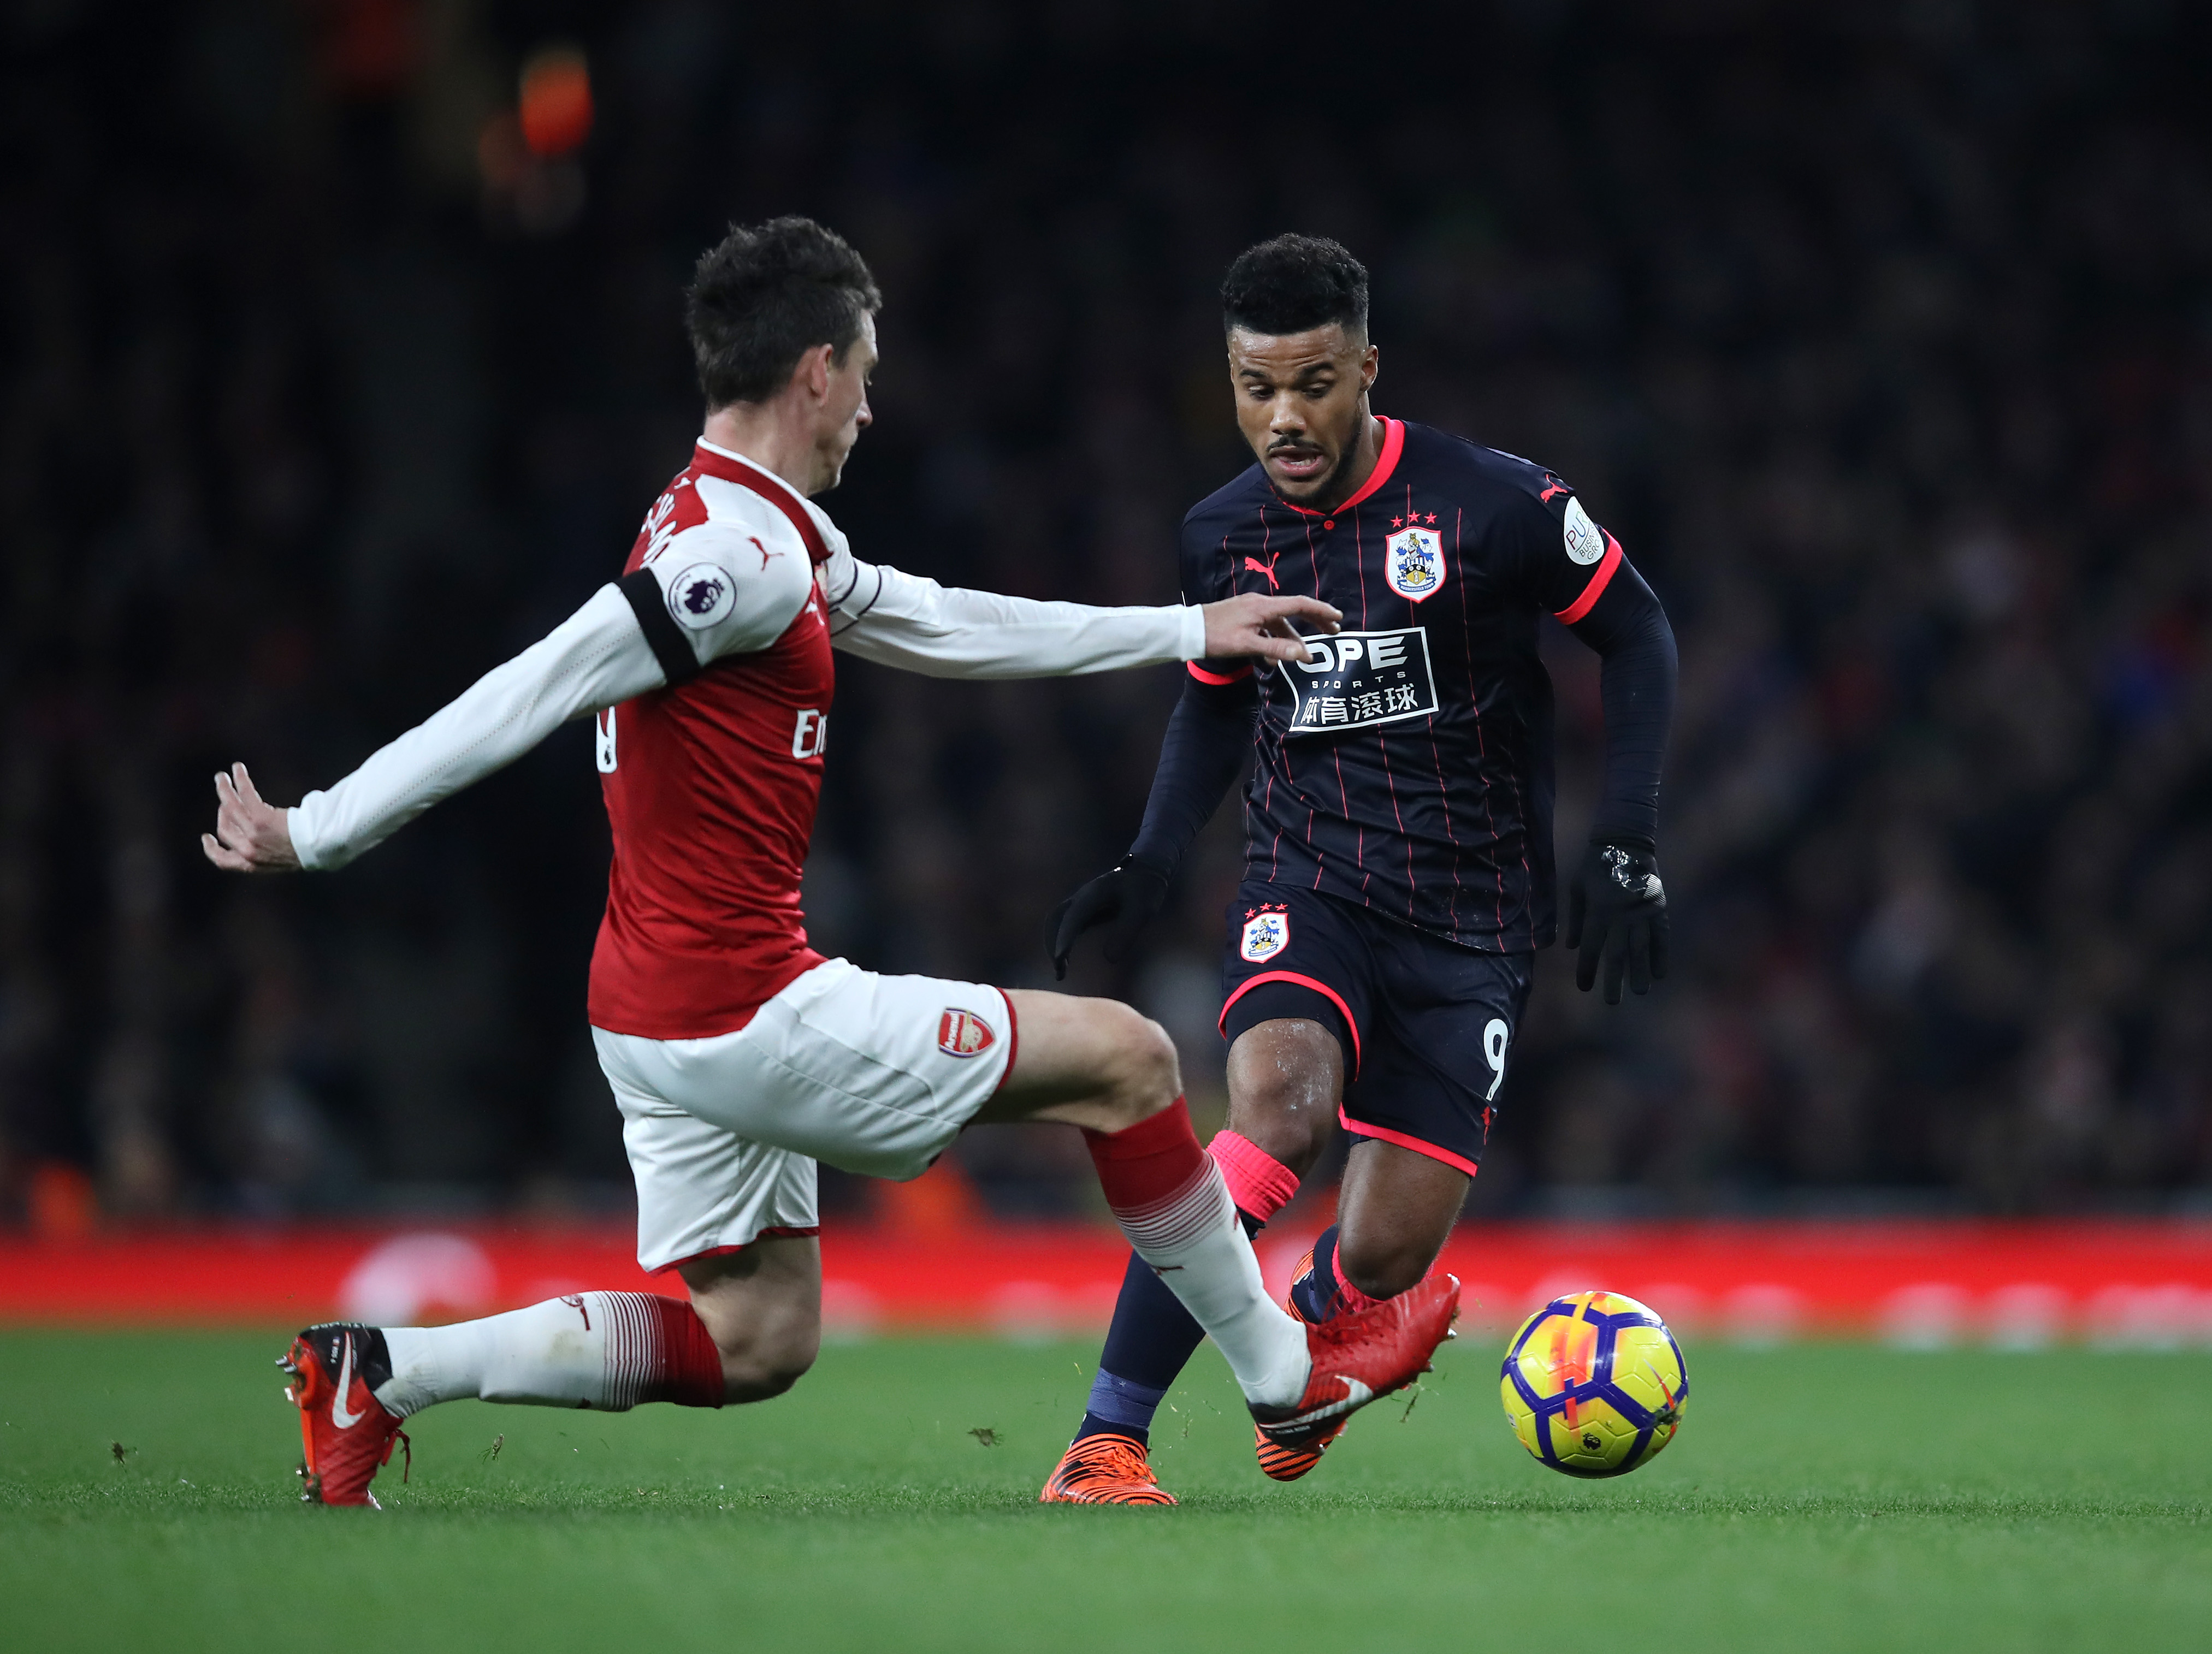 Arsenal Vs Huddersfield: Arsenal Vs Palace: 5 Key Players To Watch -- Please Score